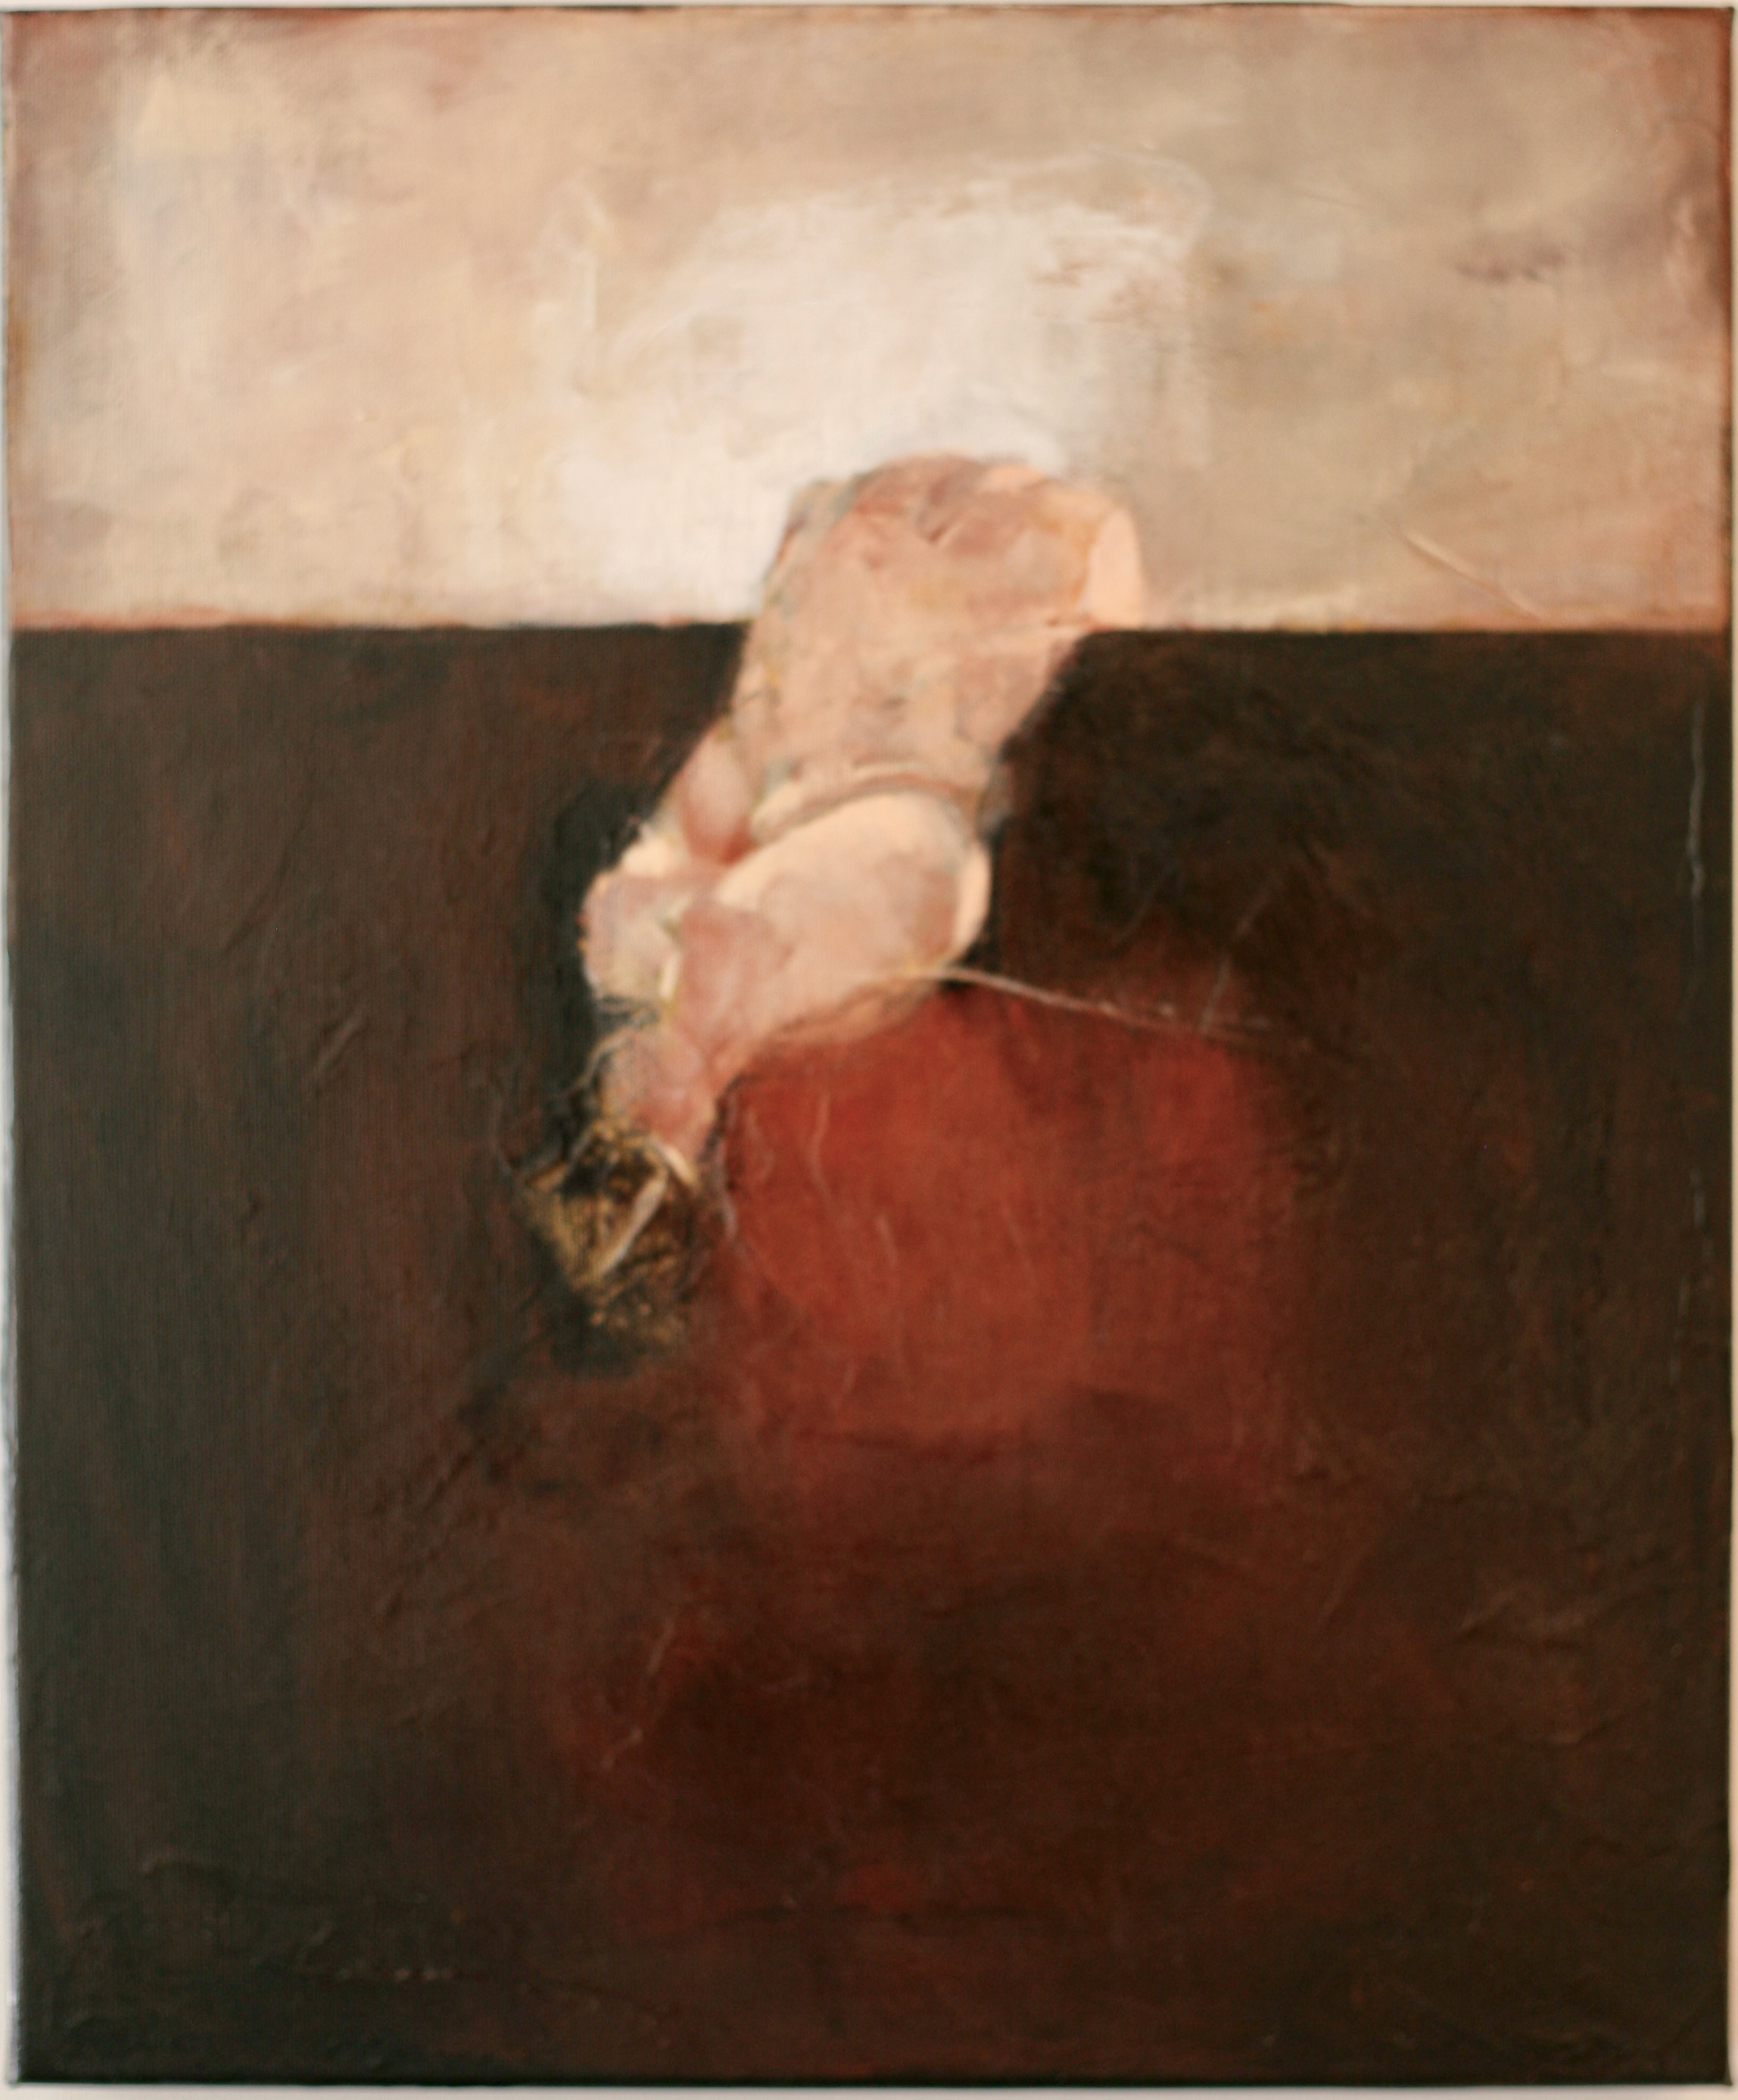 Oleg Bondarenko - Climbing the wall, oil painting